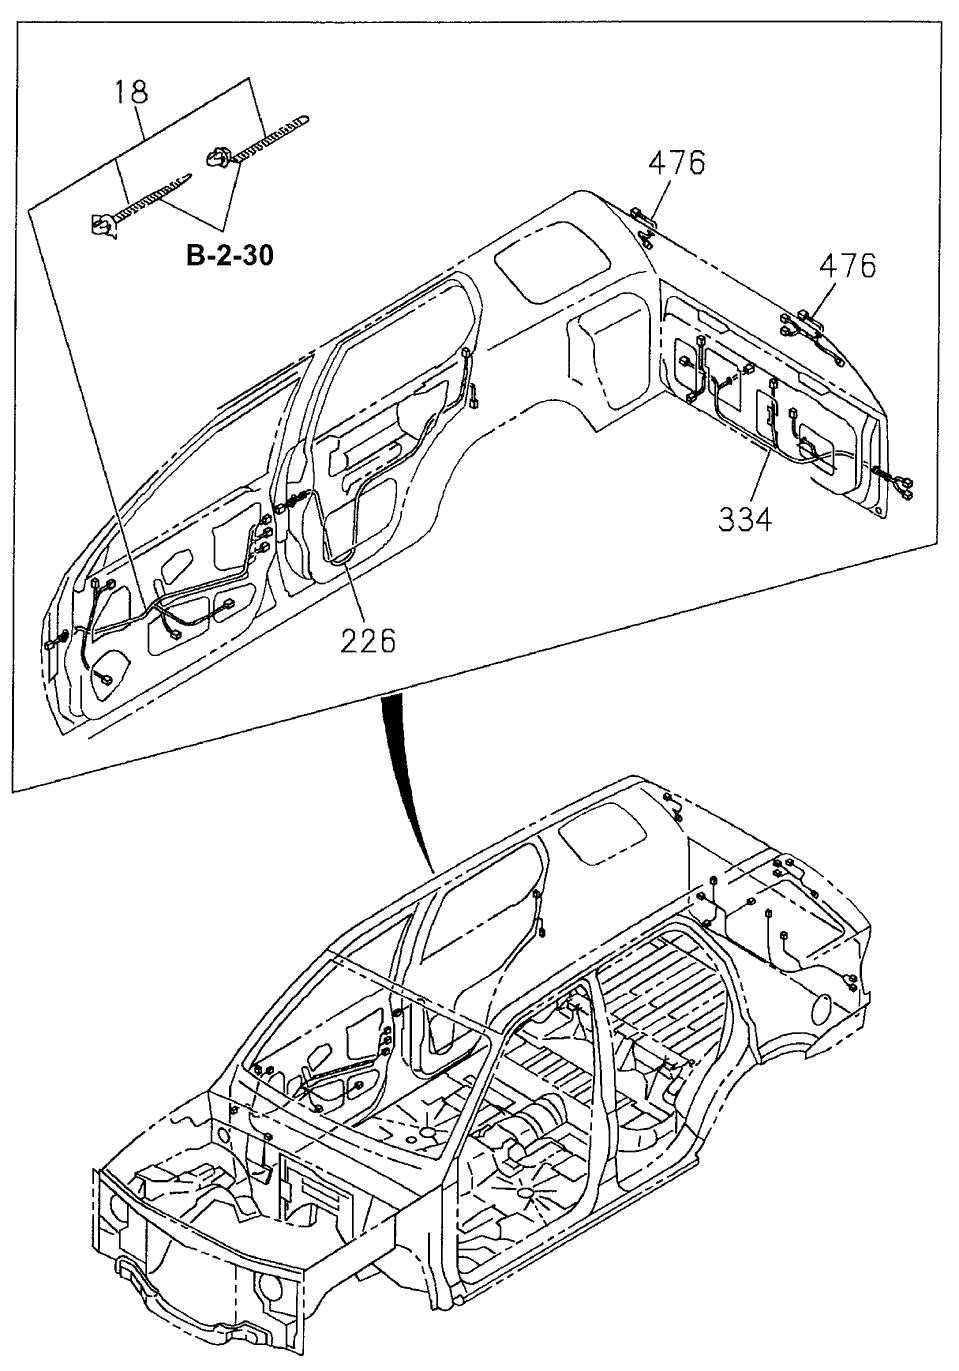 1998 Honda Passport Fuel Pump Wiring Diagram - Cars Wiring ...